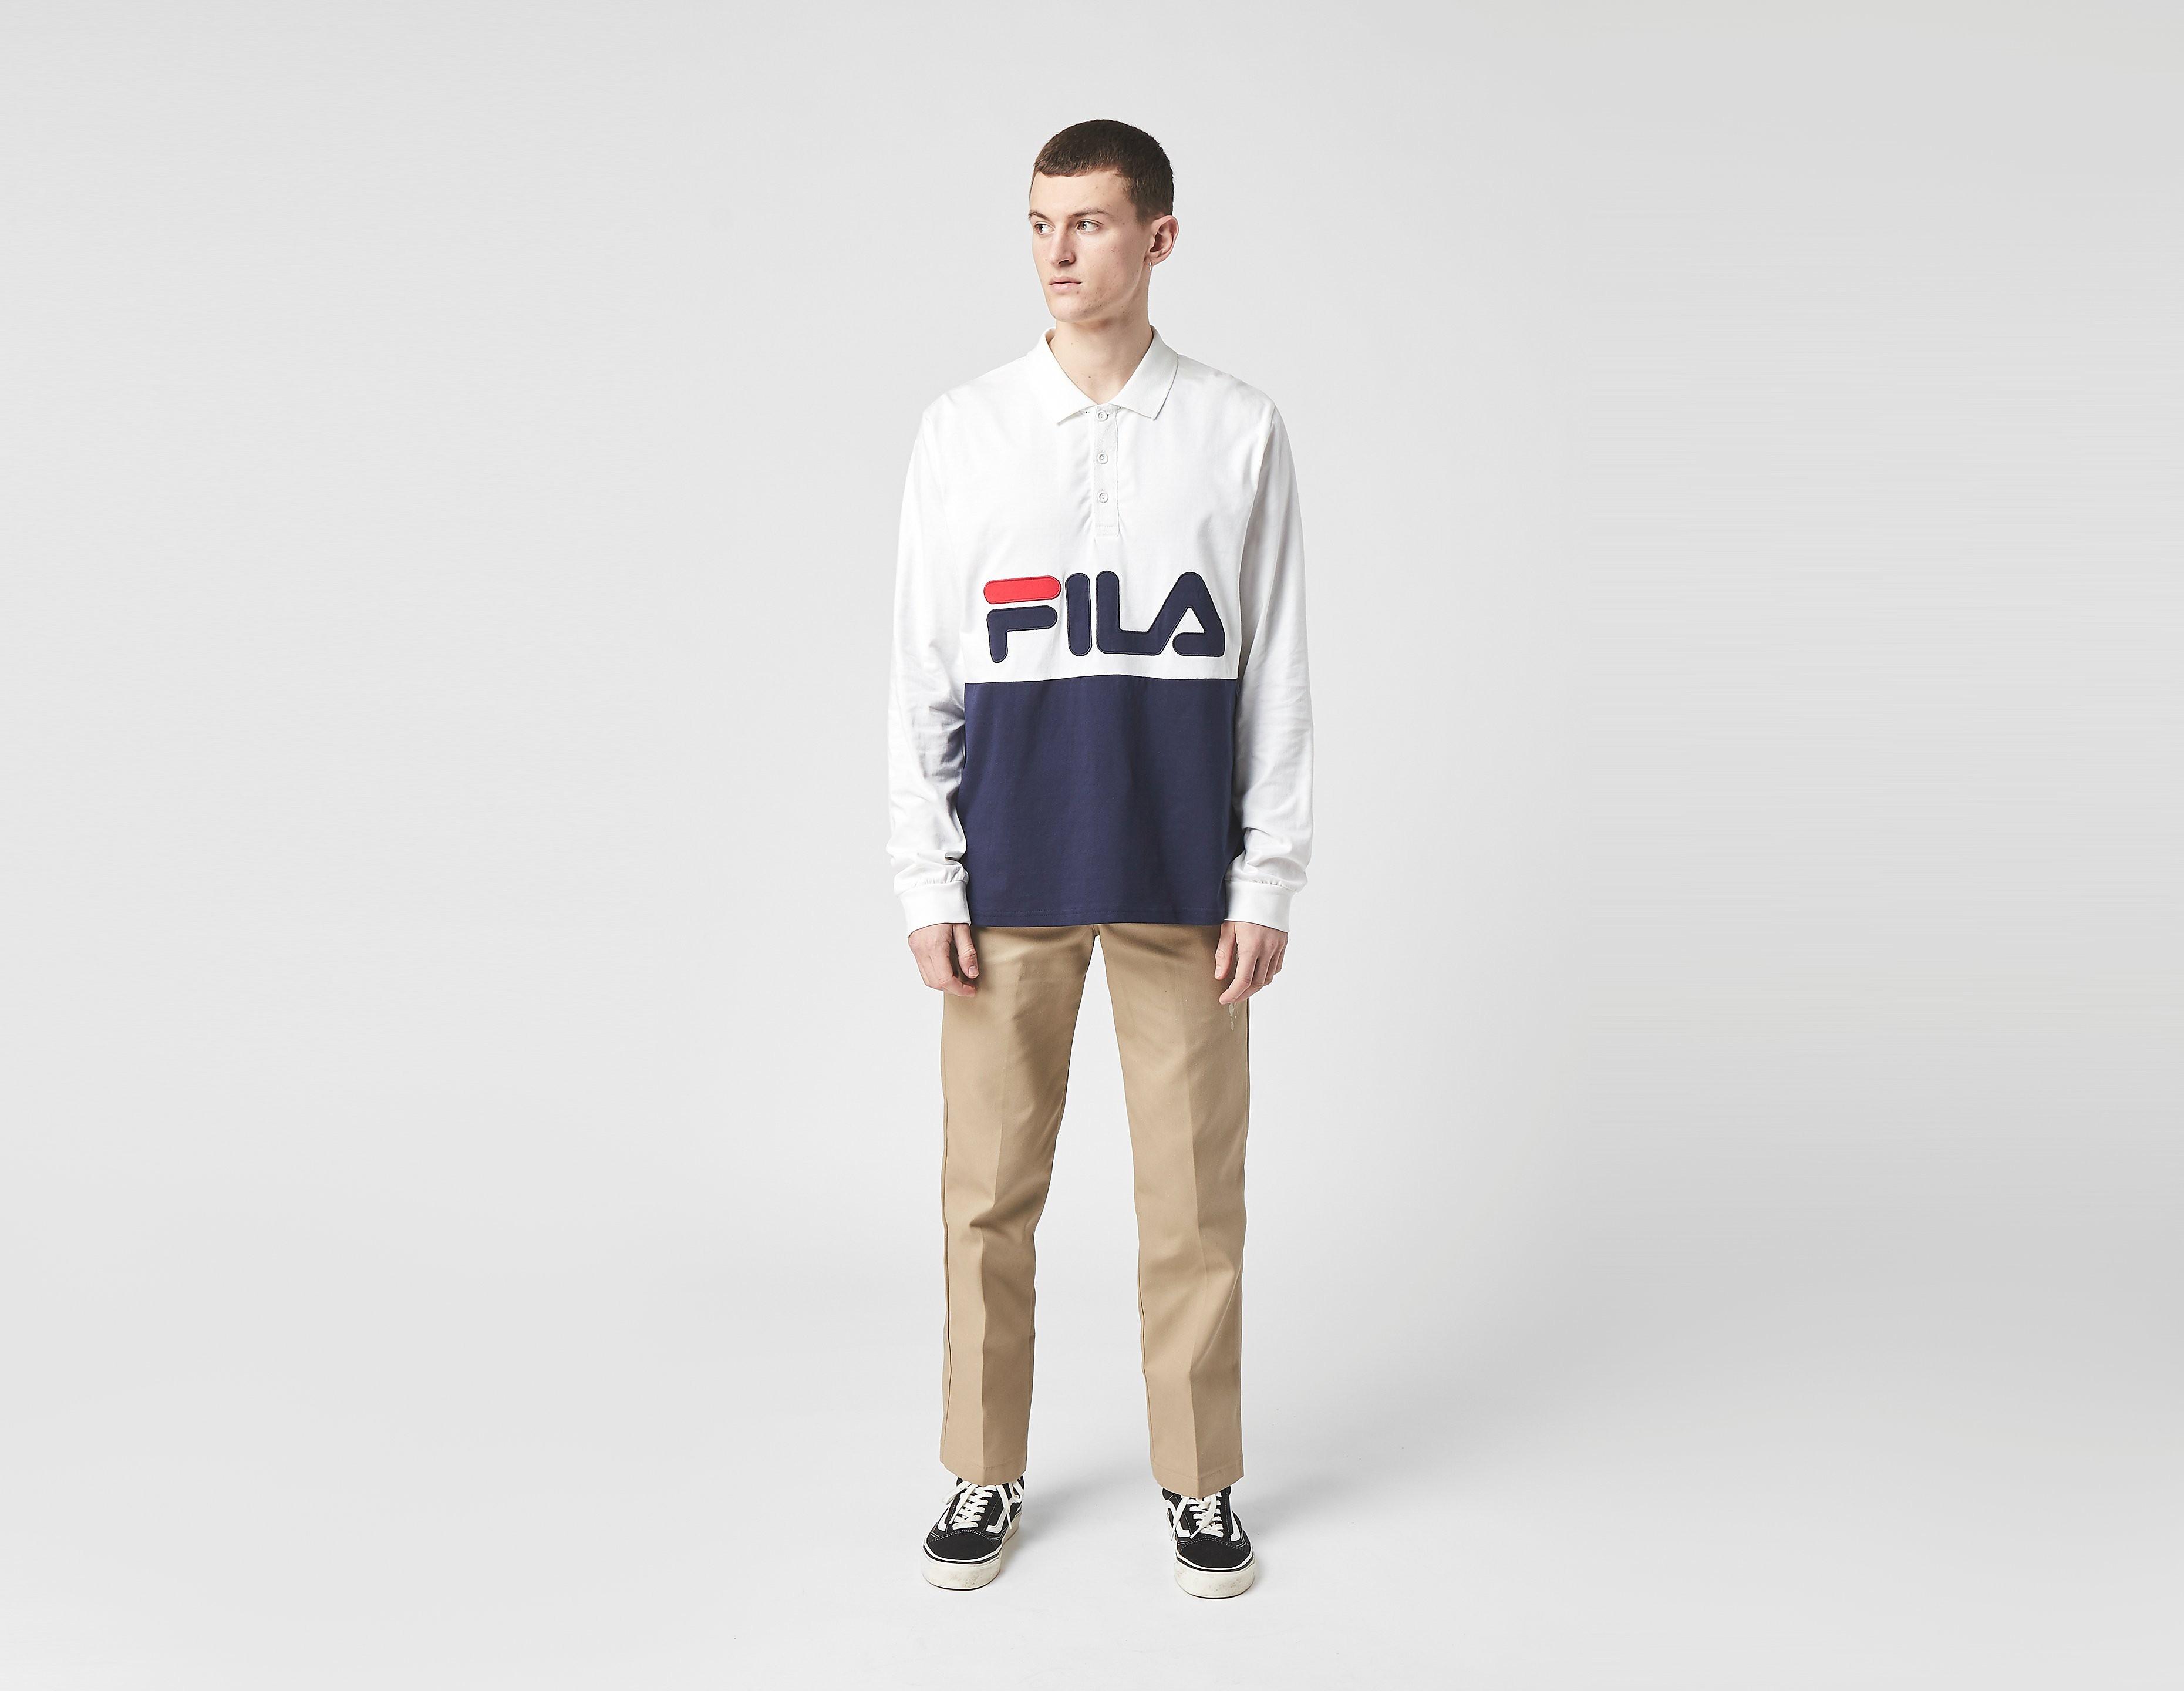 Fila Logowood Polo Shirt - size? Exclusive